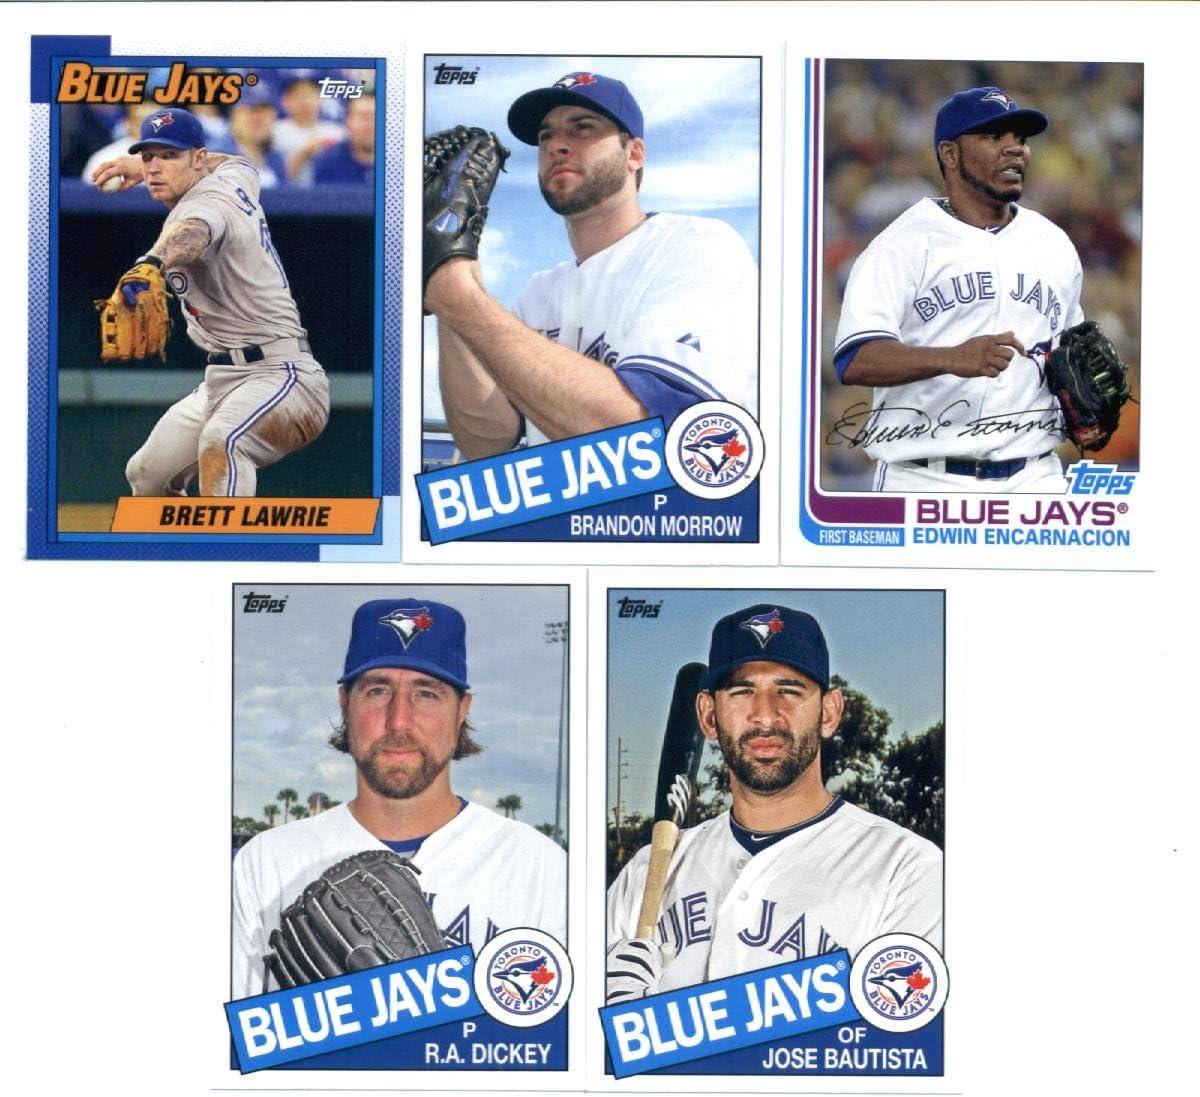 B00D64X5F4 2013 Topps Archives Baseball Cards Team Set (Storage Album) - Toronto Blue Jays (5 Cards) : Edwin Encarnacion Brandon Morrow R.A. Dickey Jose Bautista Brett Lawrie 71MCj-l4NeL